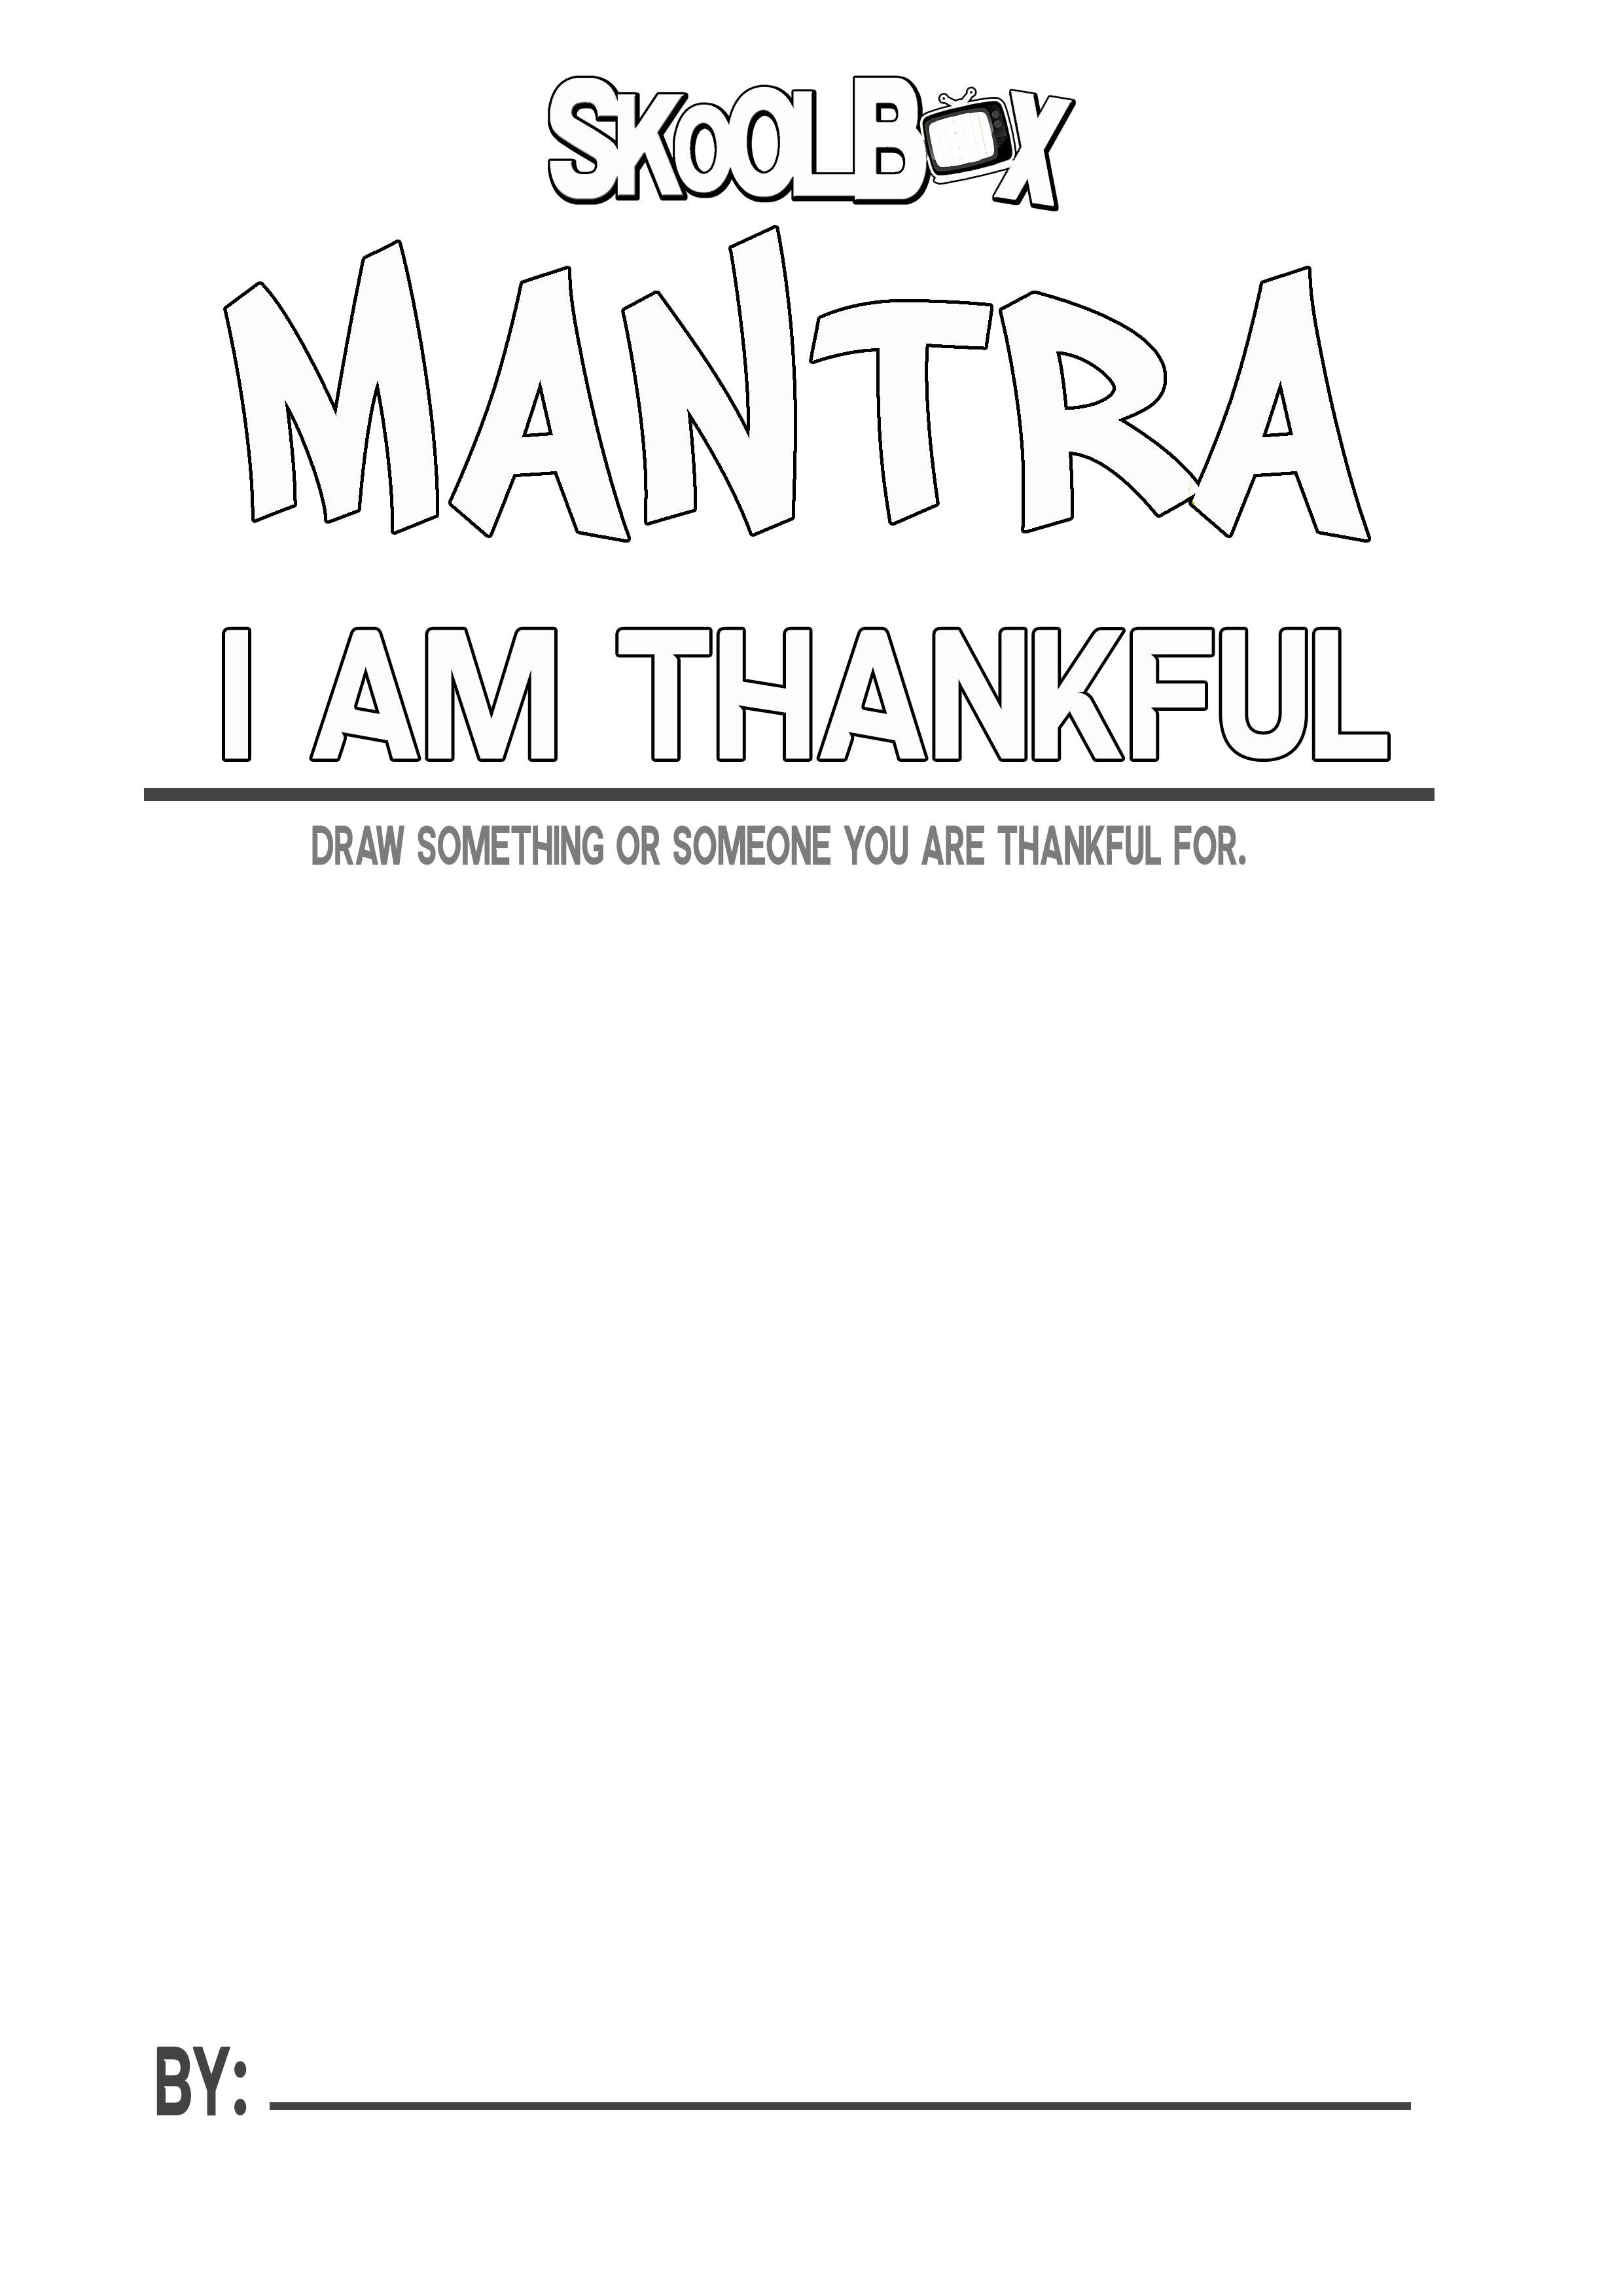 MANTRA 1 THANKFULl